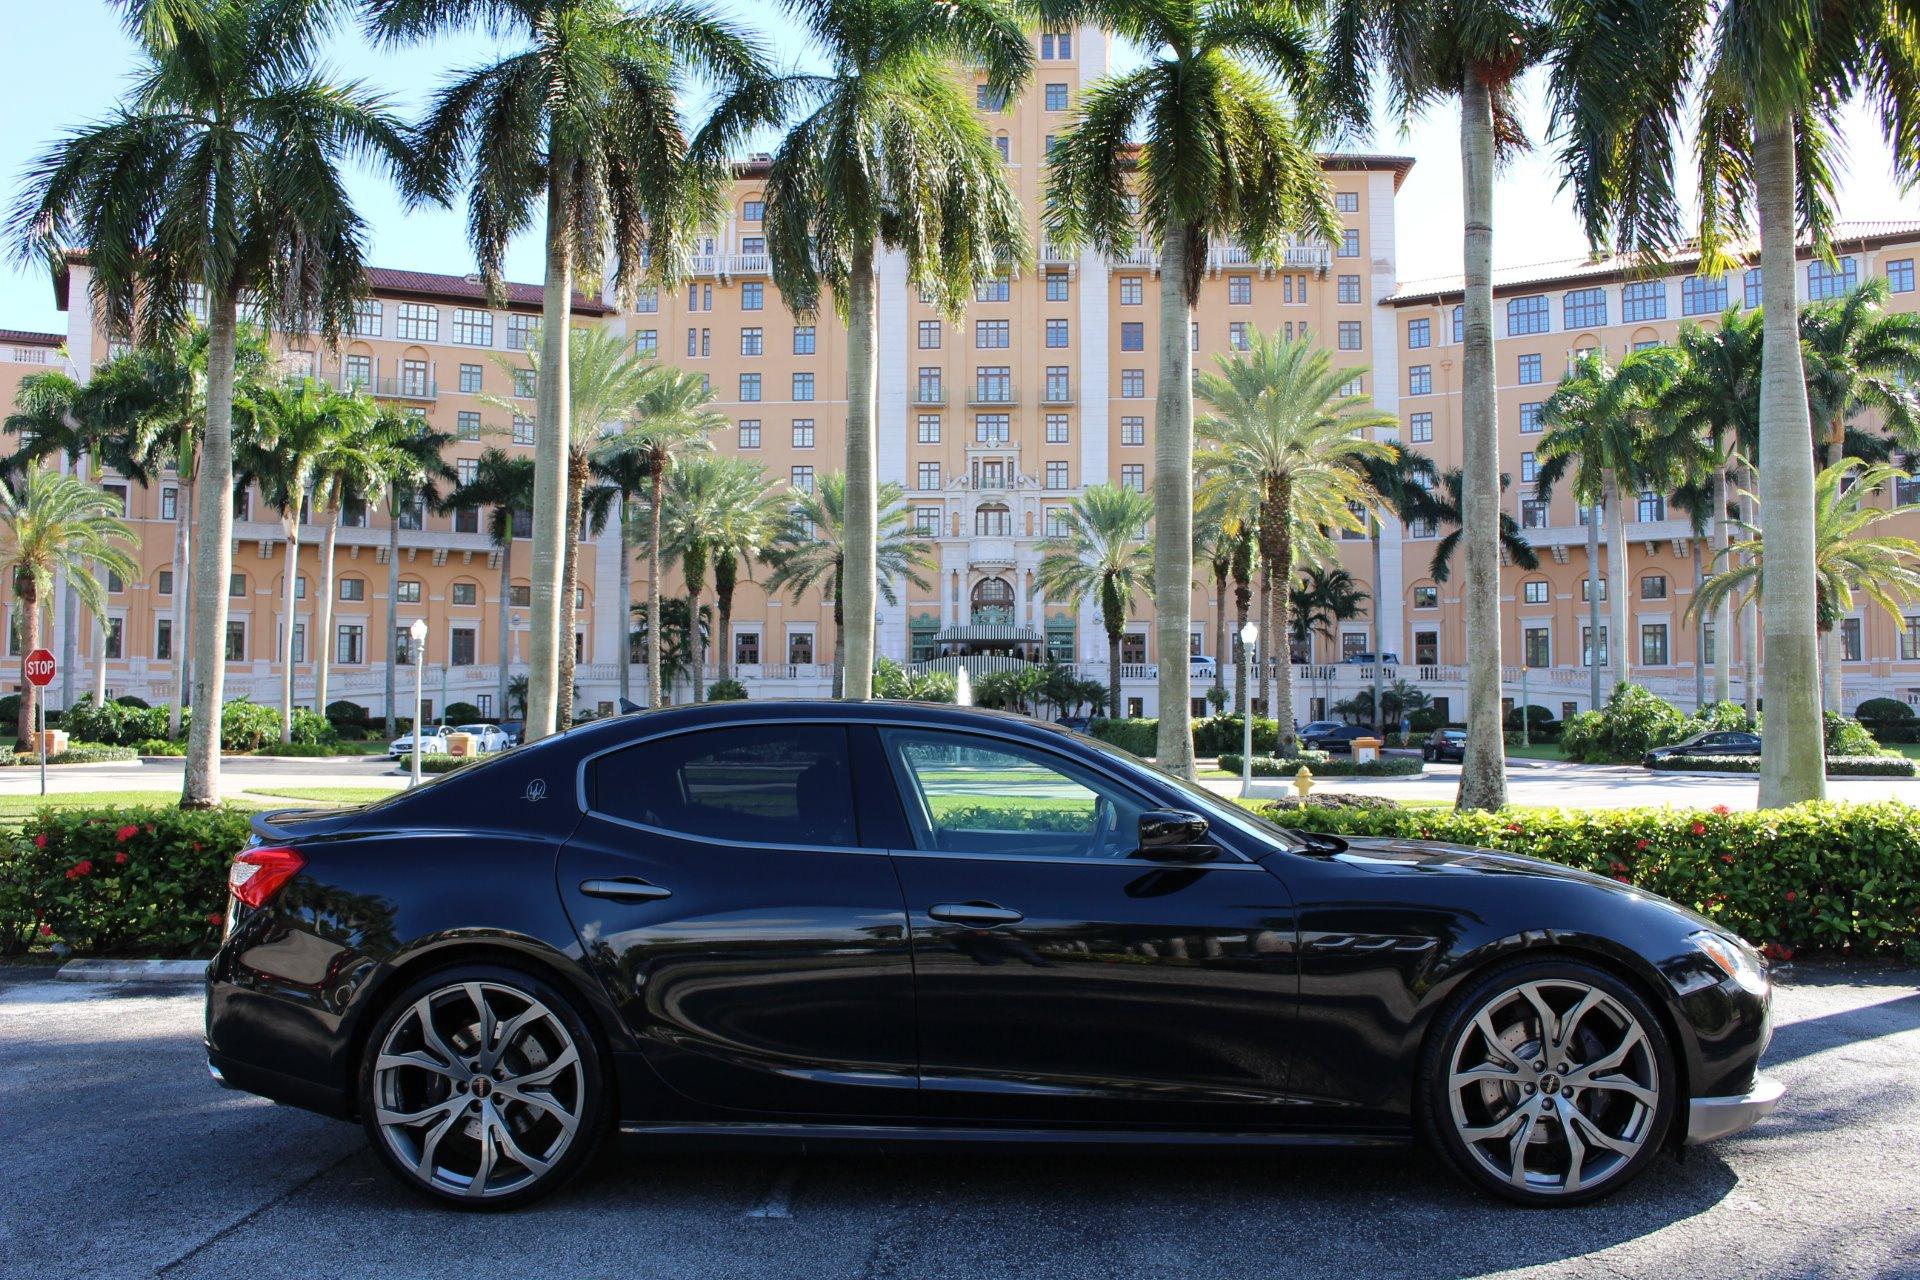 Used 2015 Maserati Ghibli SQ4 Novitec for sale Sold at The Gables Sports Cars in Miami FL 33146 1